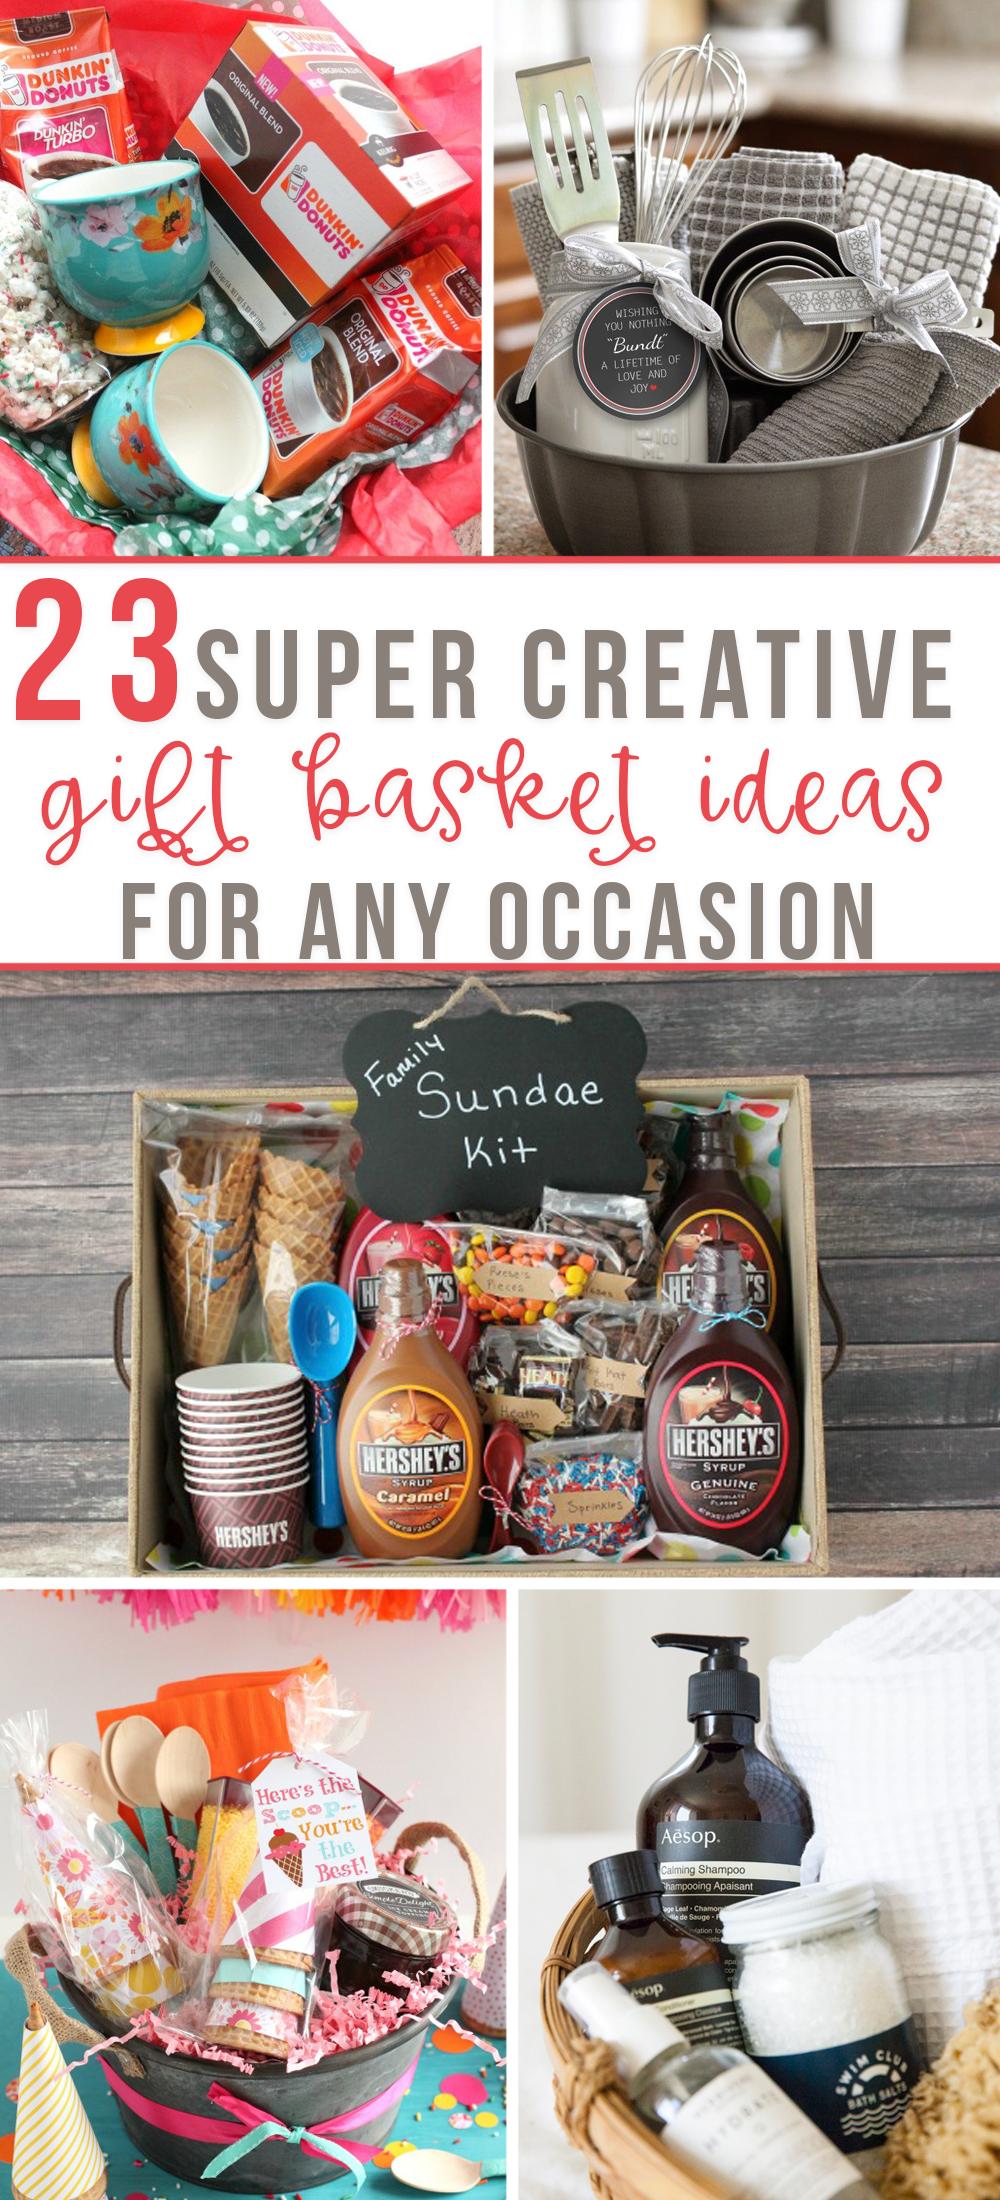 23 Creative Gift Baskets for Any Occasion | Diy geschenke, Geschenk ...